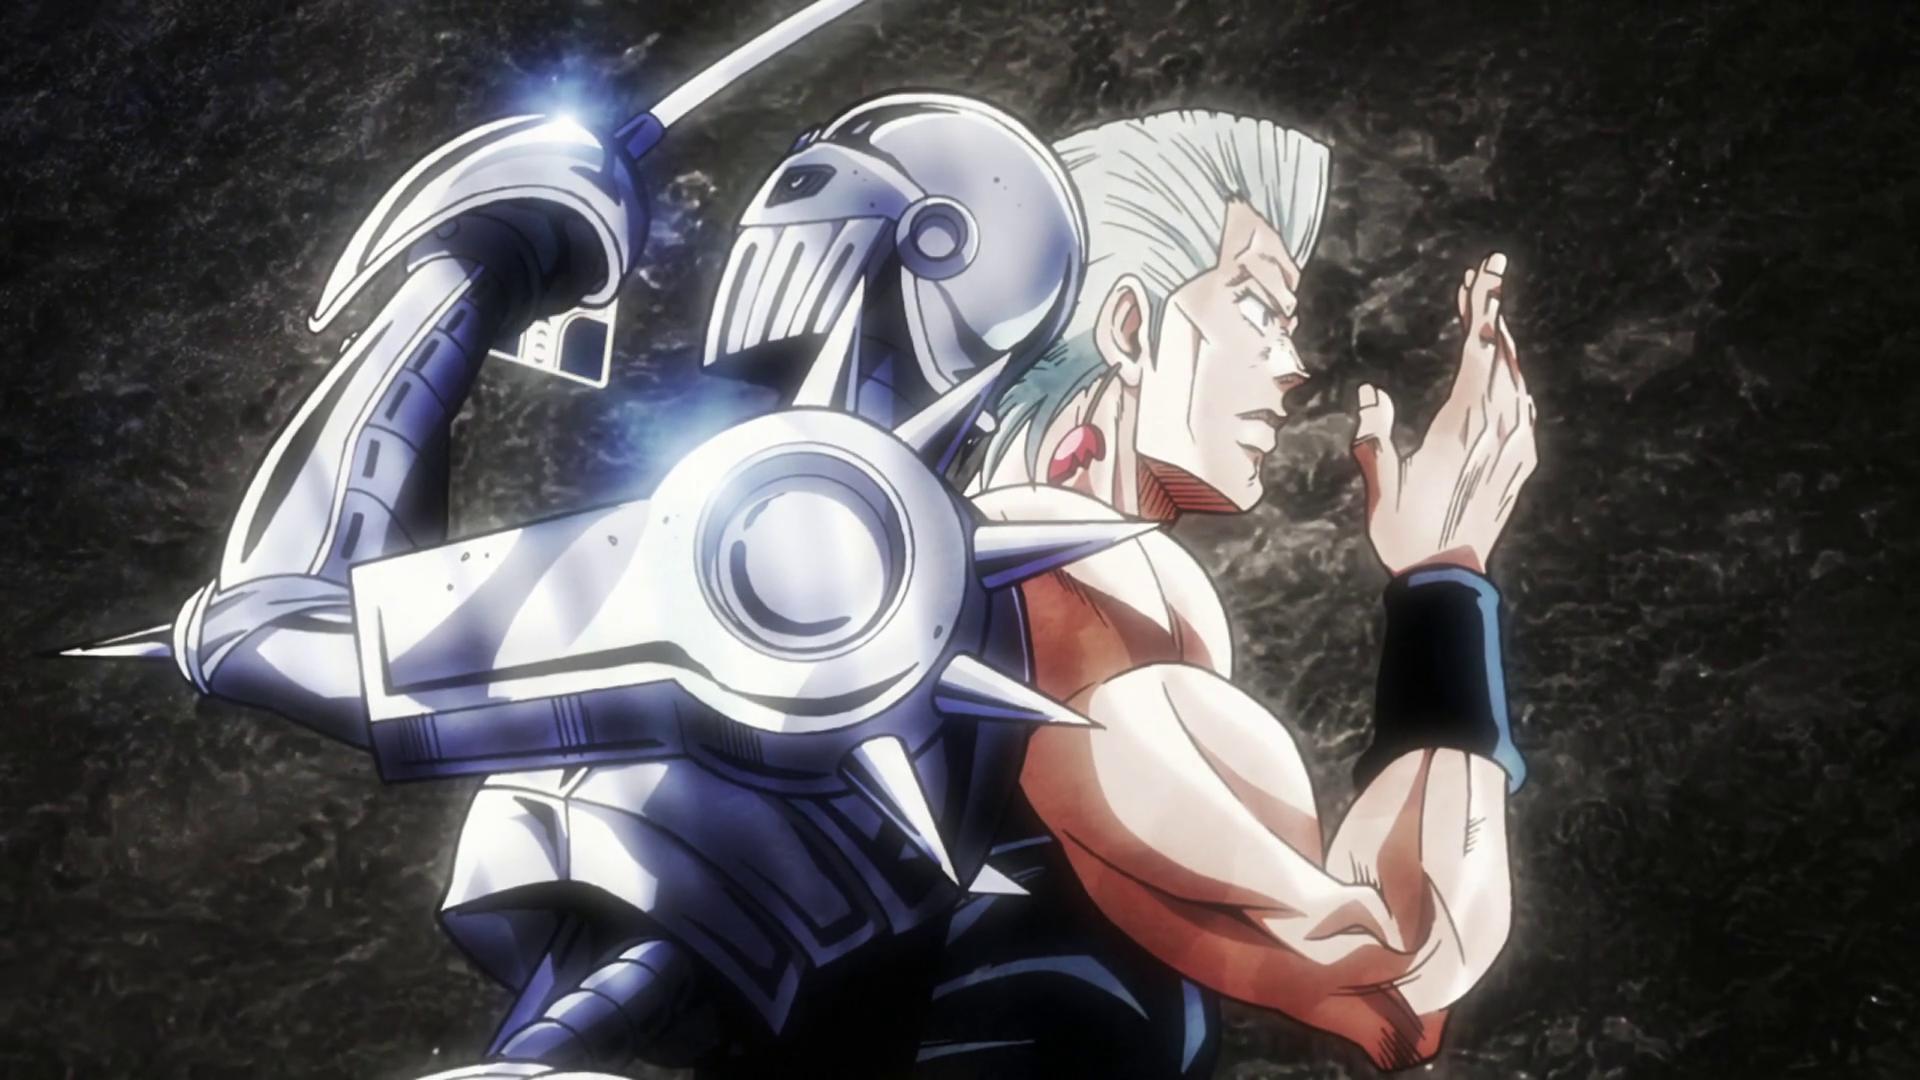 Wallpaper Anime Jojo S Bizarre Adventure Stardust Crusaders